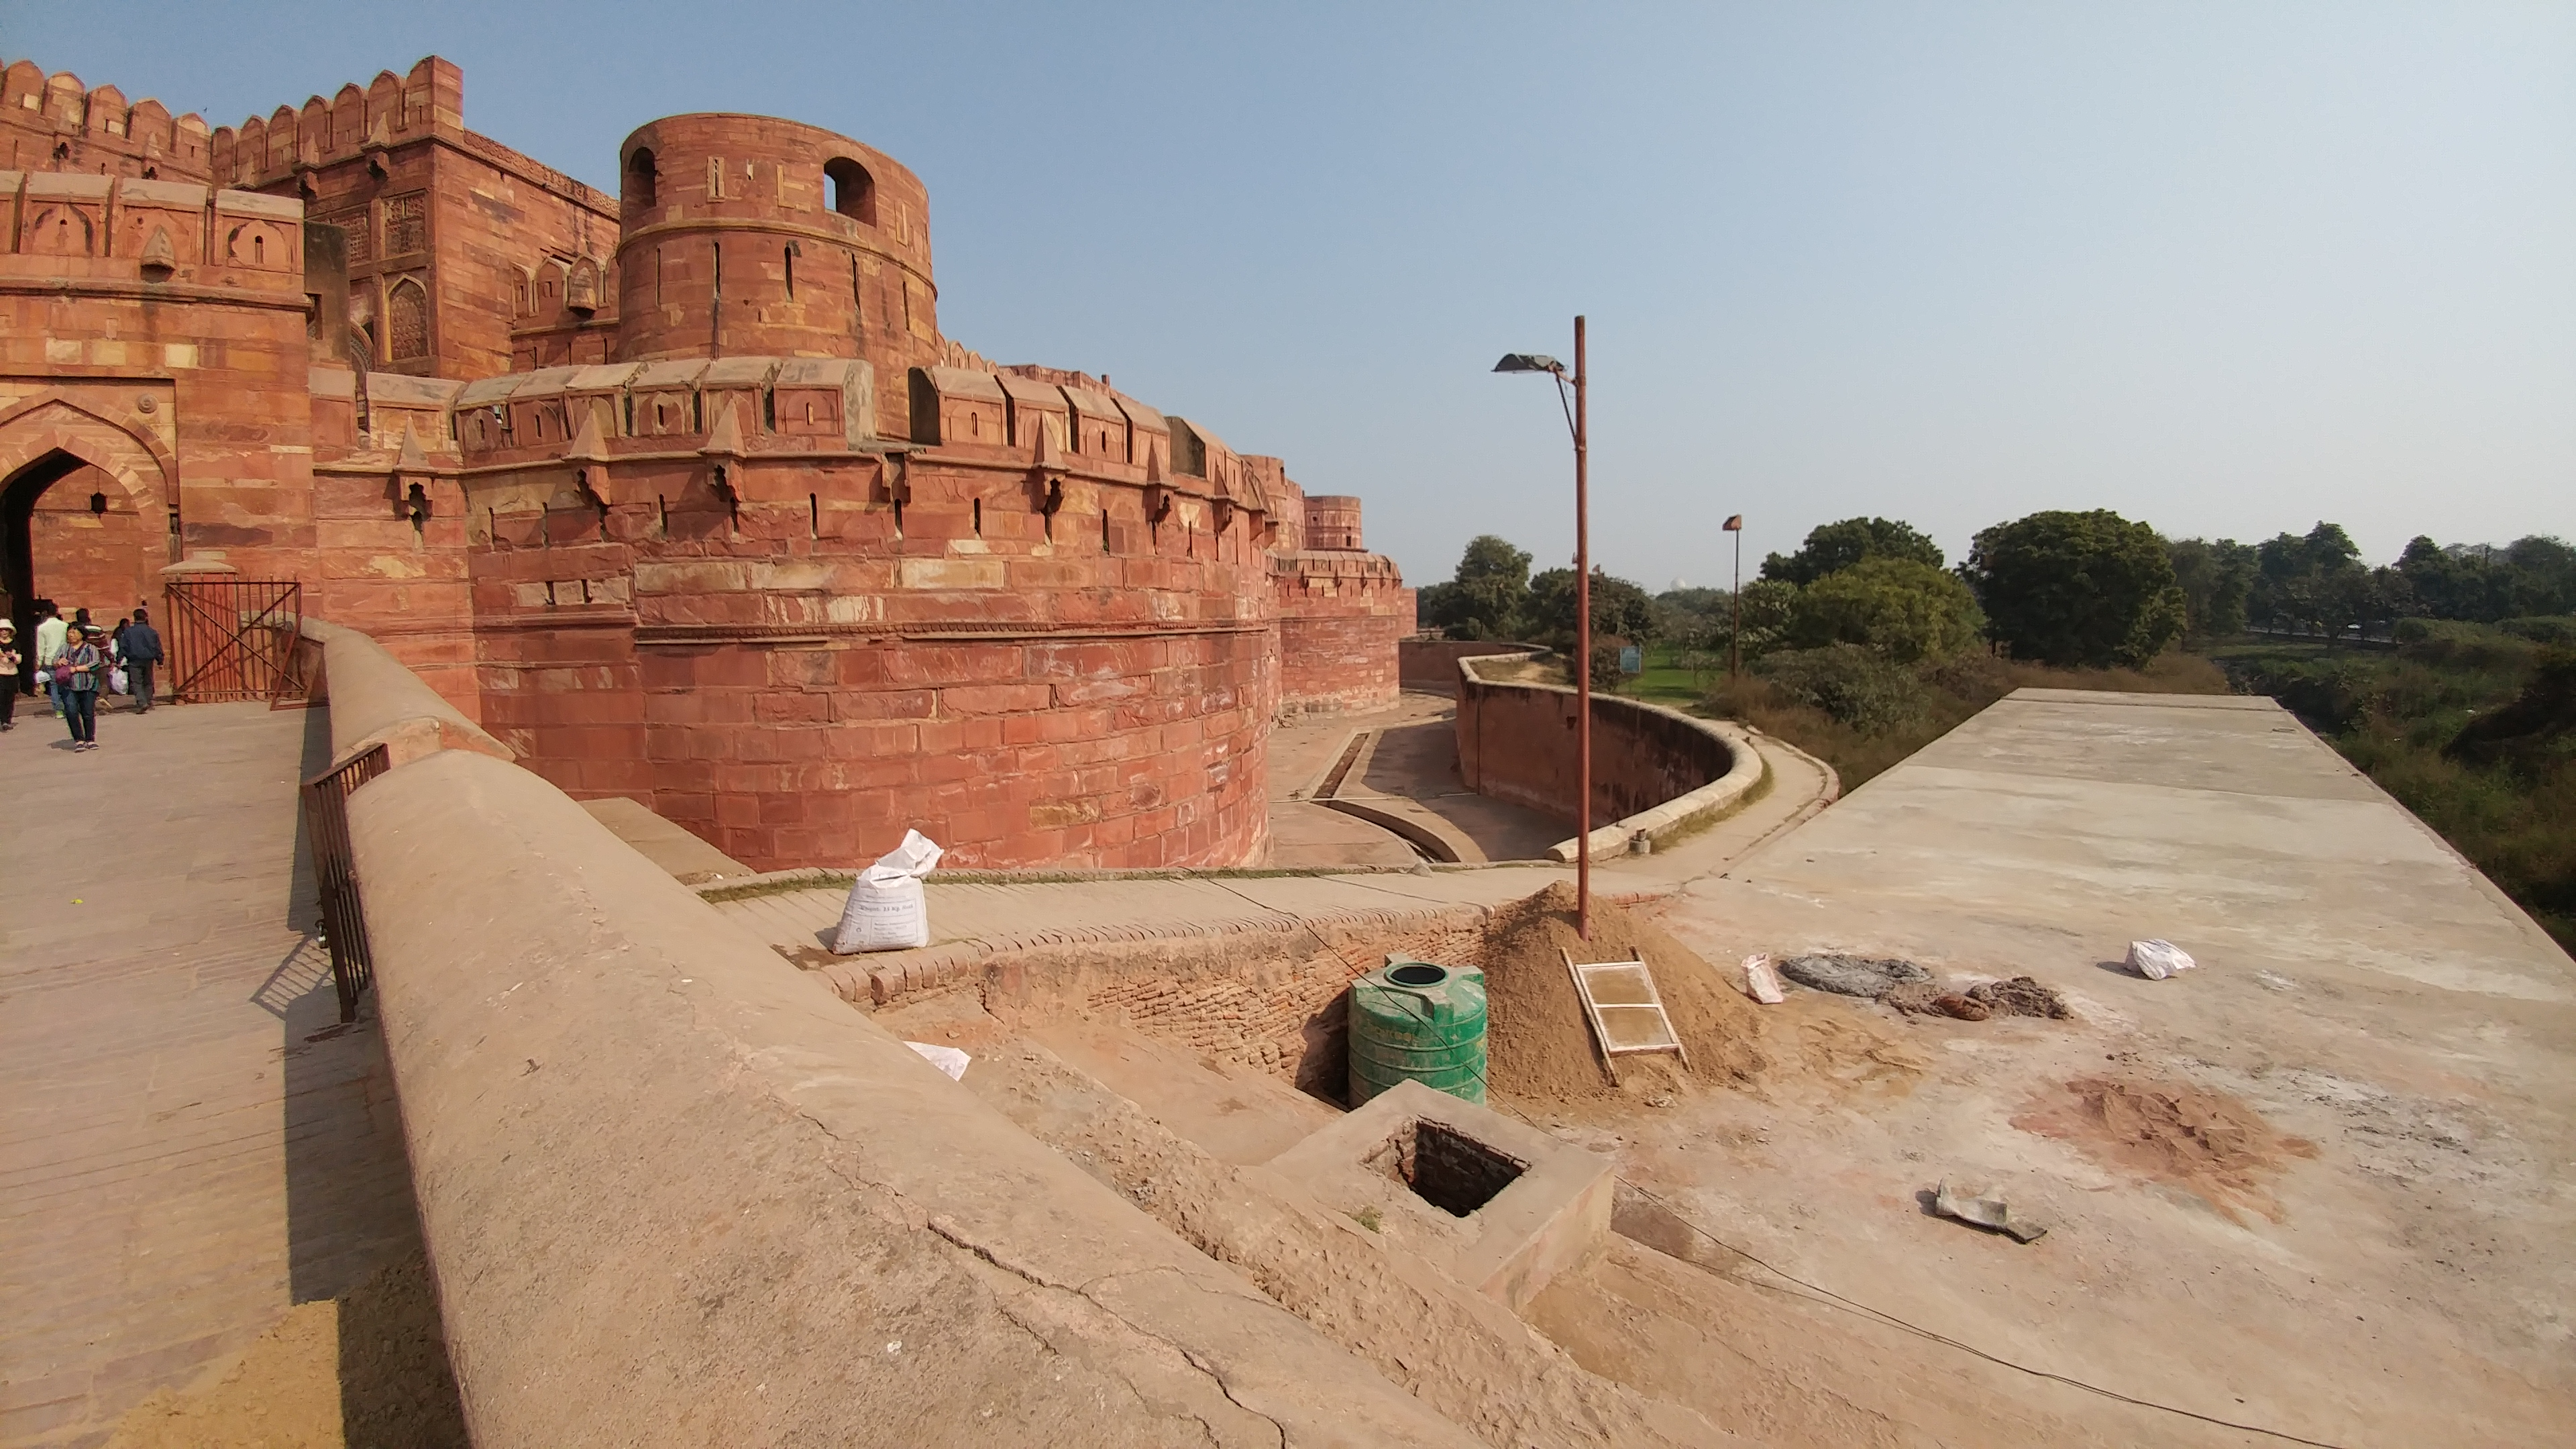 Agra Fort - Beware of alligators